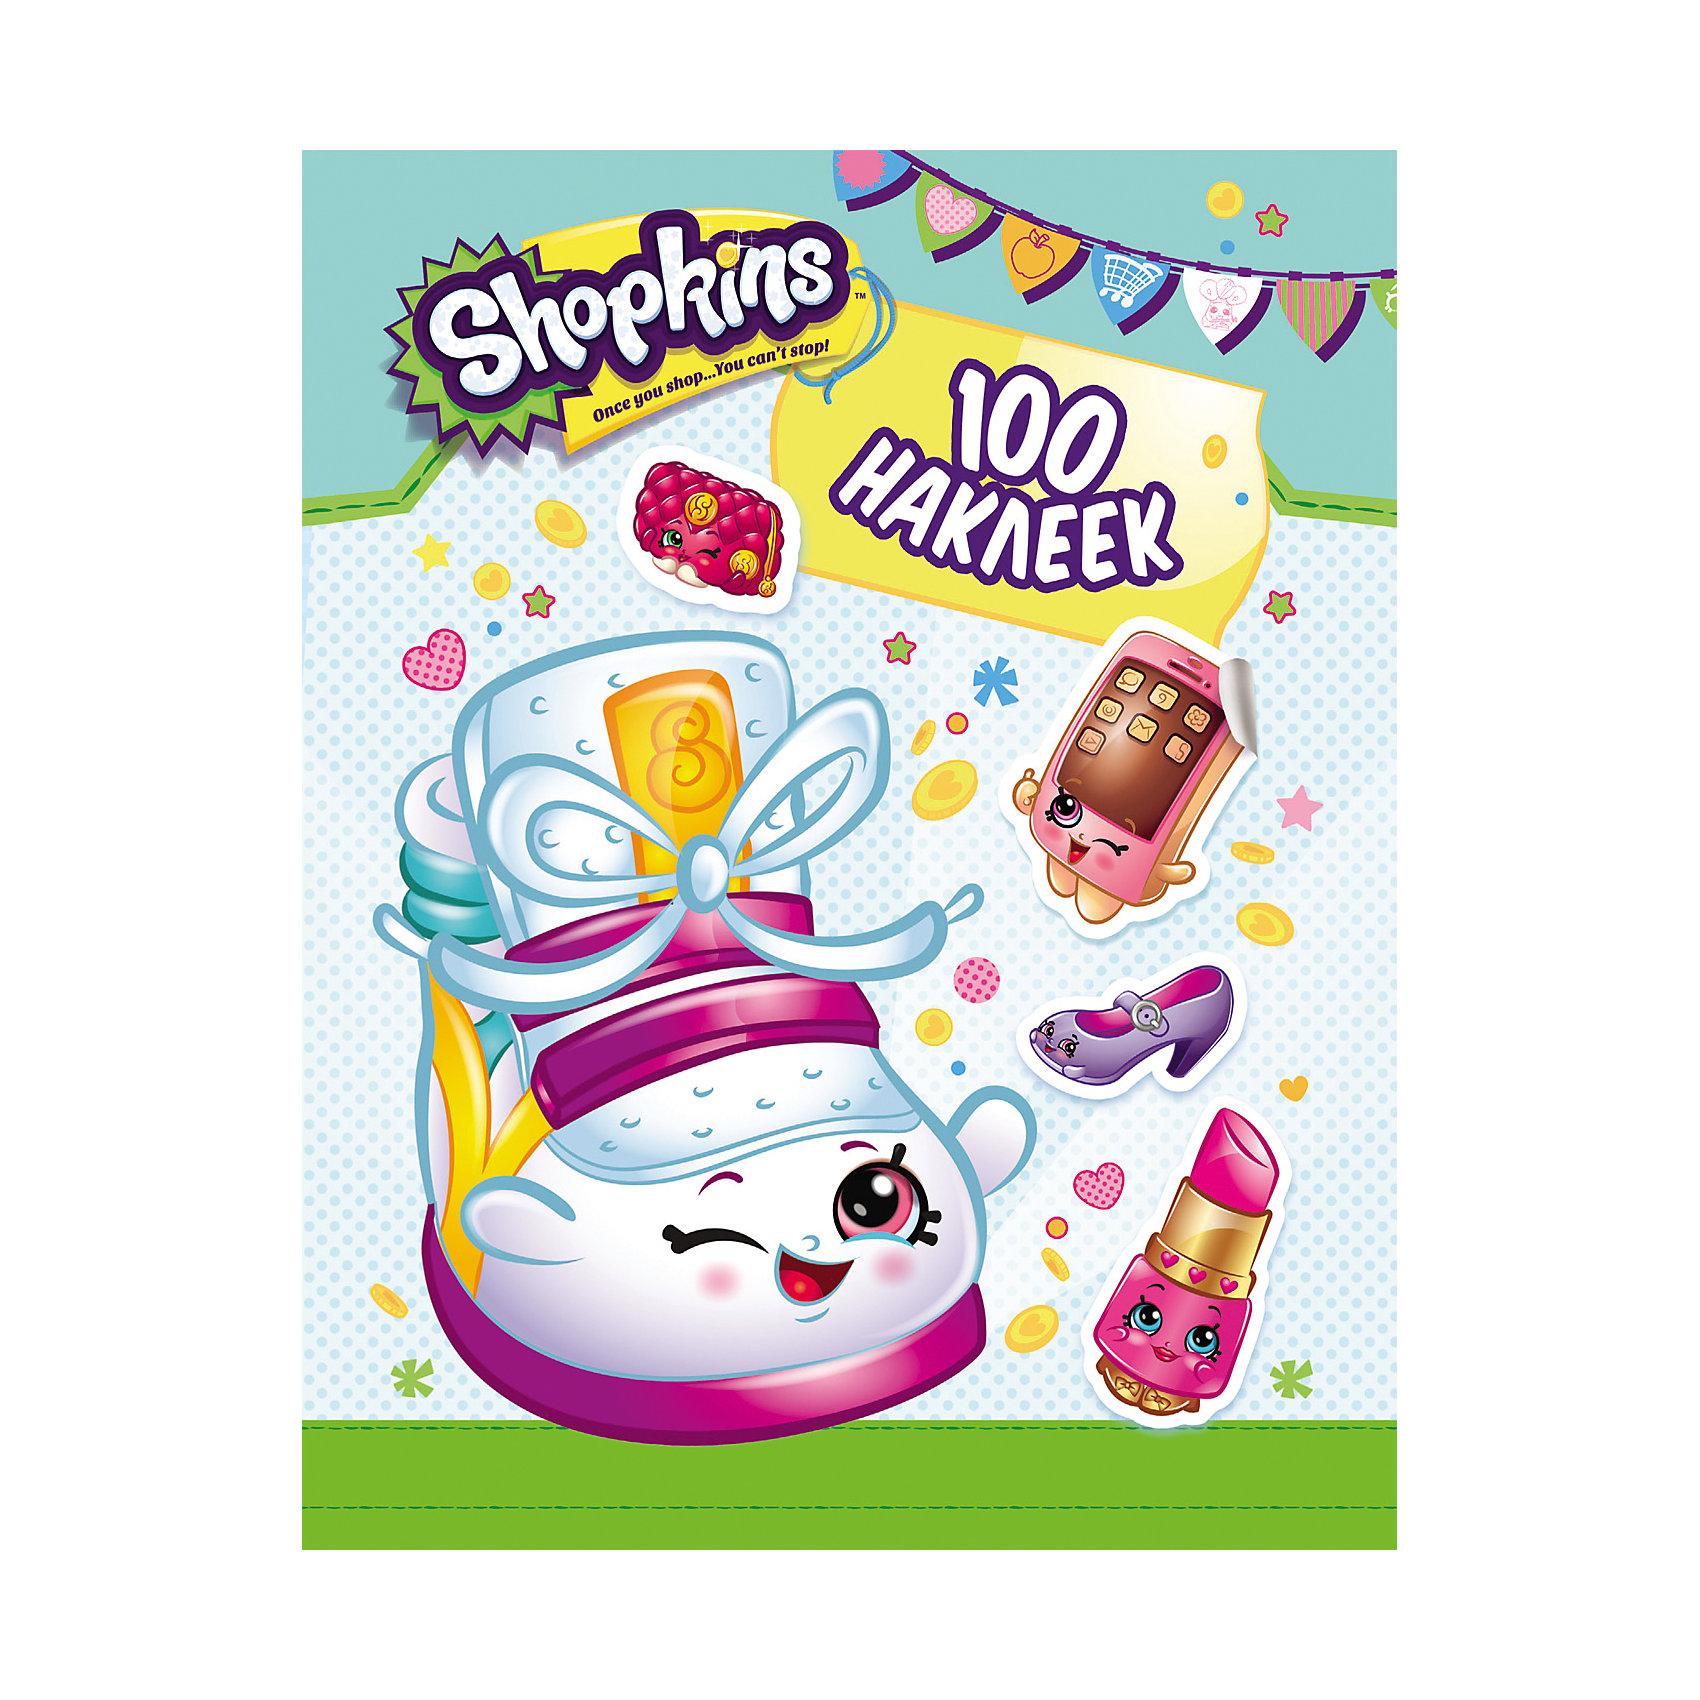 100 наклеек, цвет бирюзовый, Shopkins